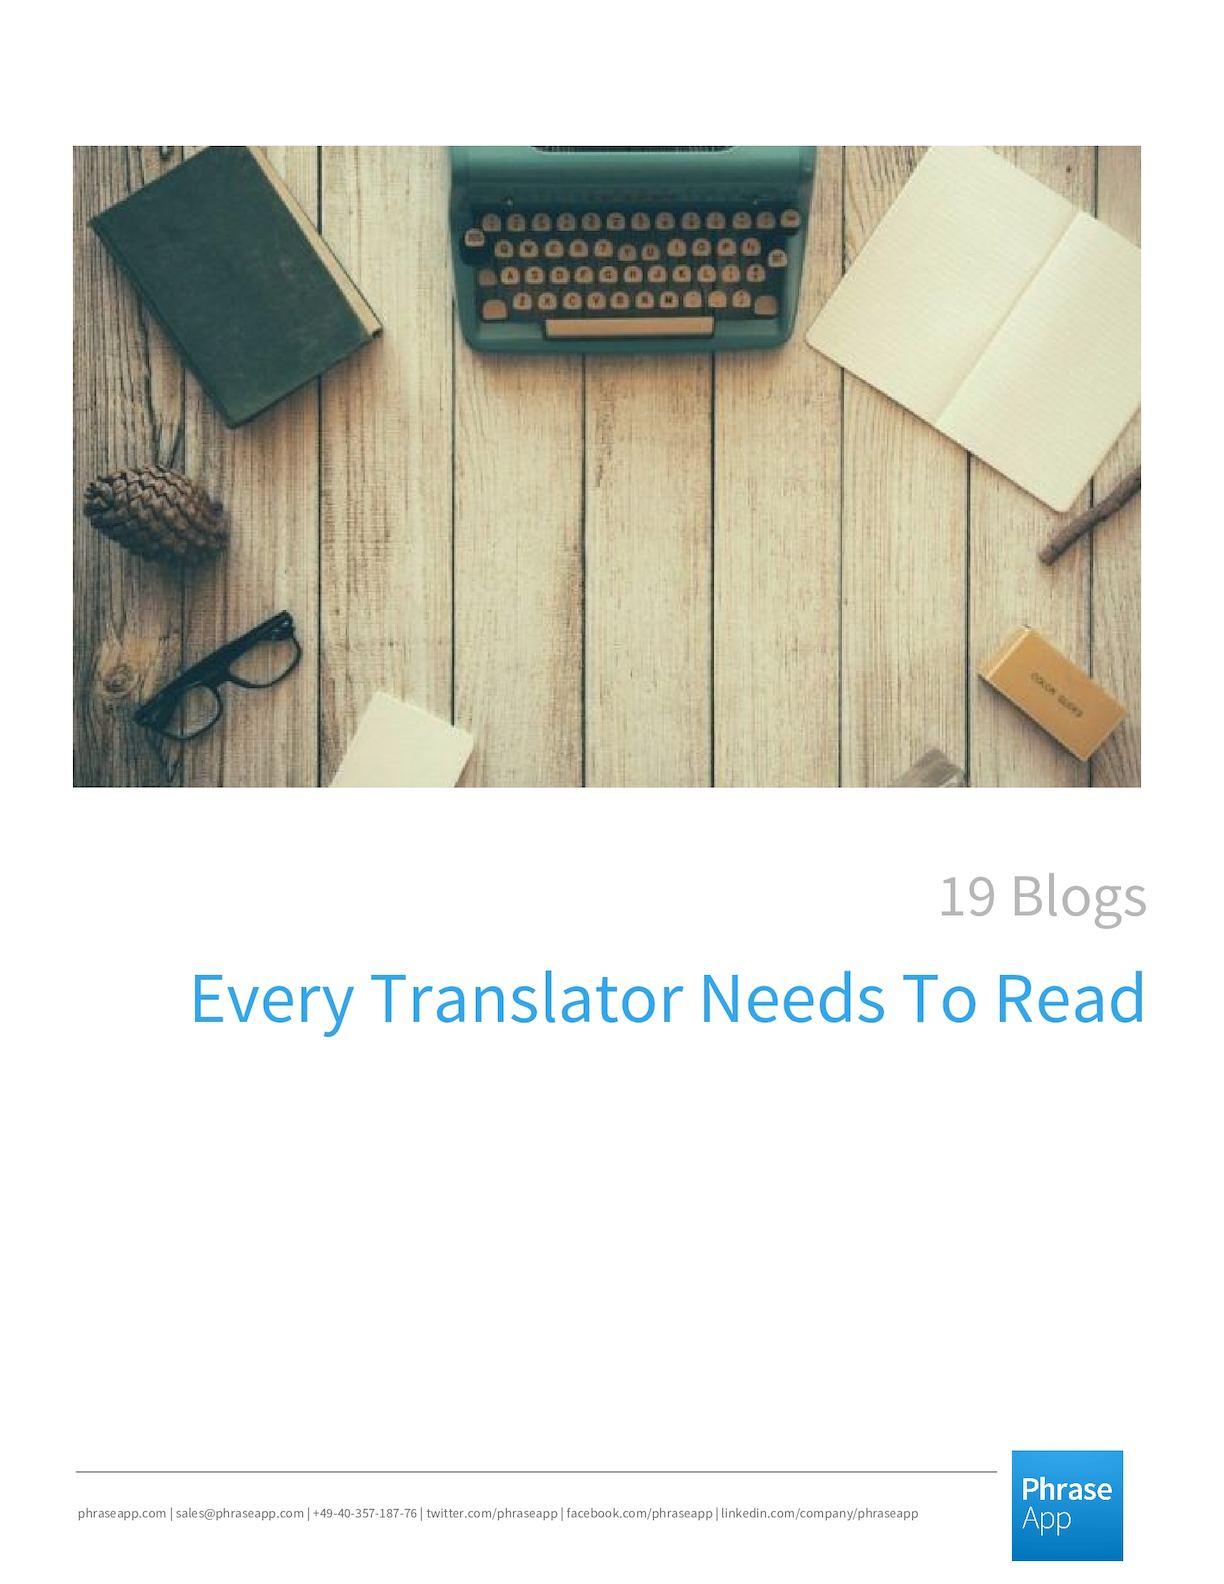 19 Blogs Every Translator Needs To Read